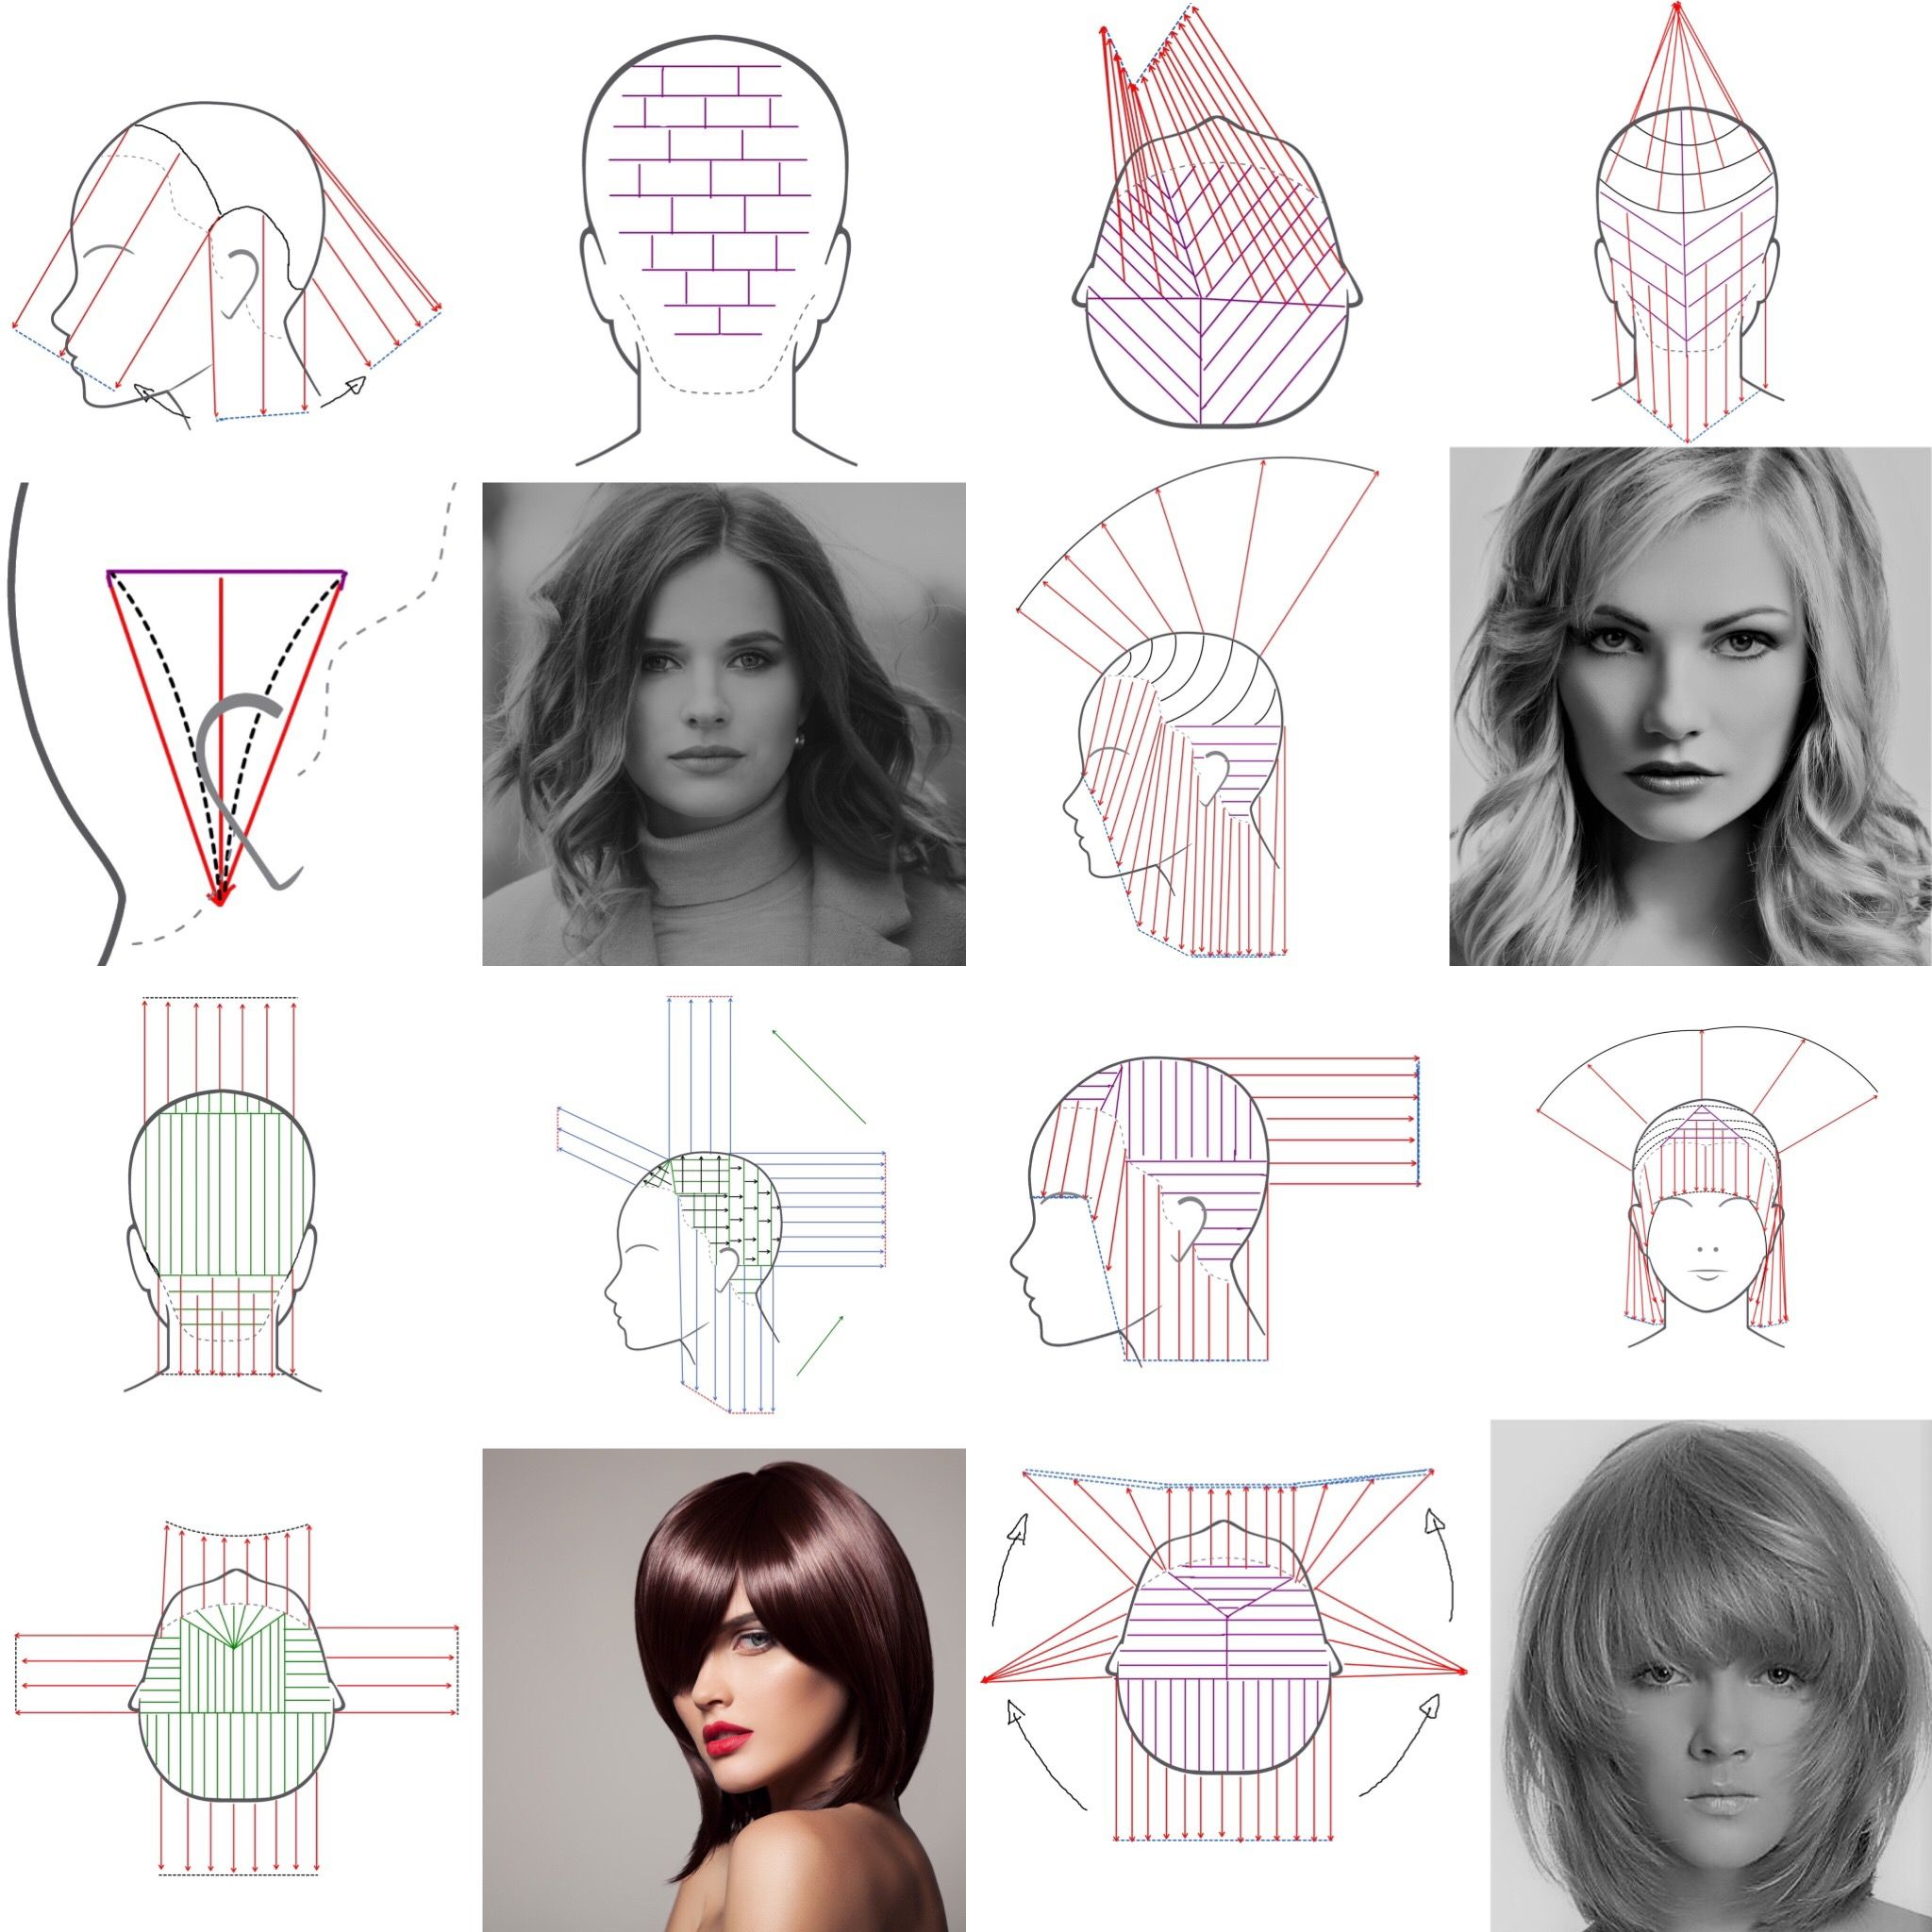 Advanced Layers Haircuts Haarschneidetechniken Stufenhaarschnitt Haare Selber Schneiden Anleitung